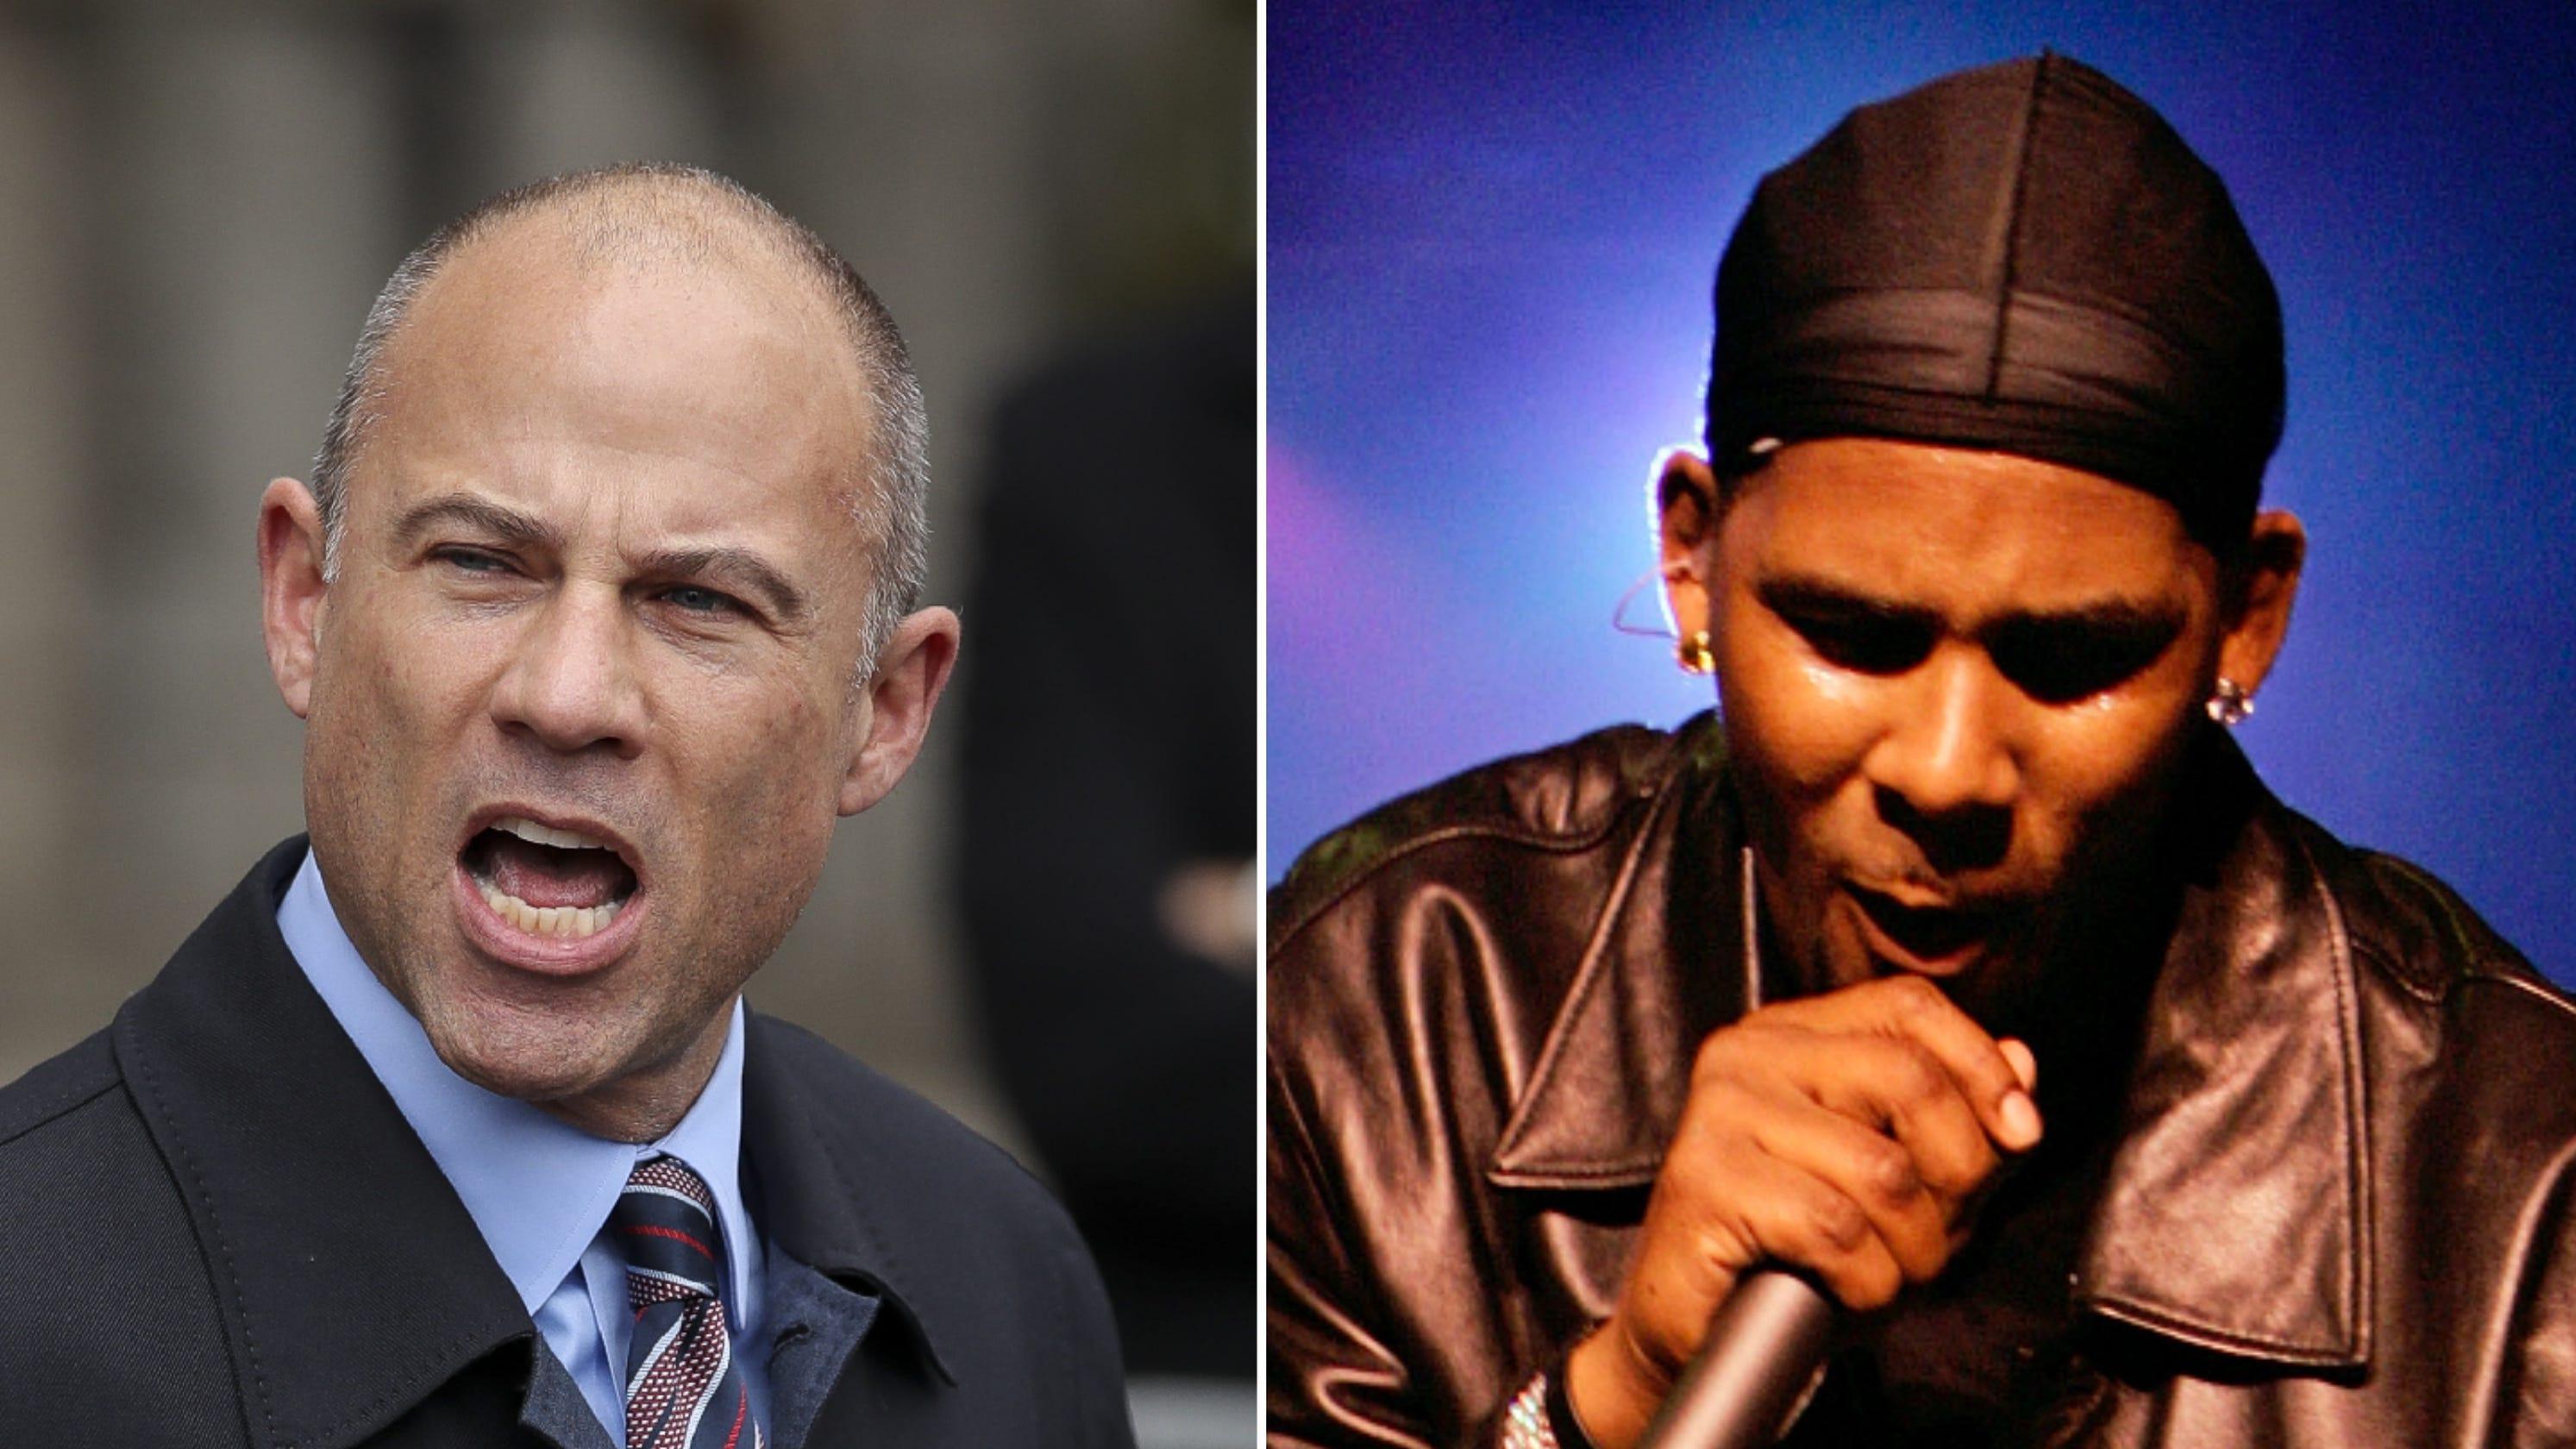 R  Kelly: Michael Avenatti claims new sex tape, says trial